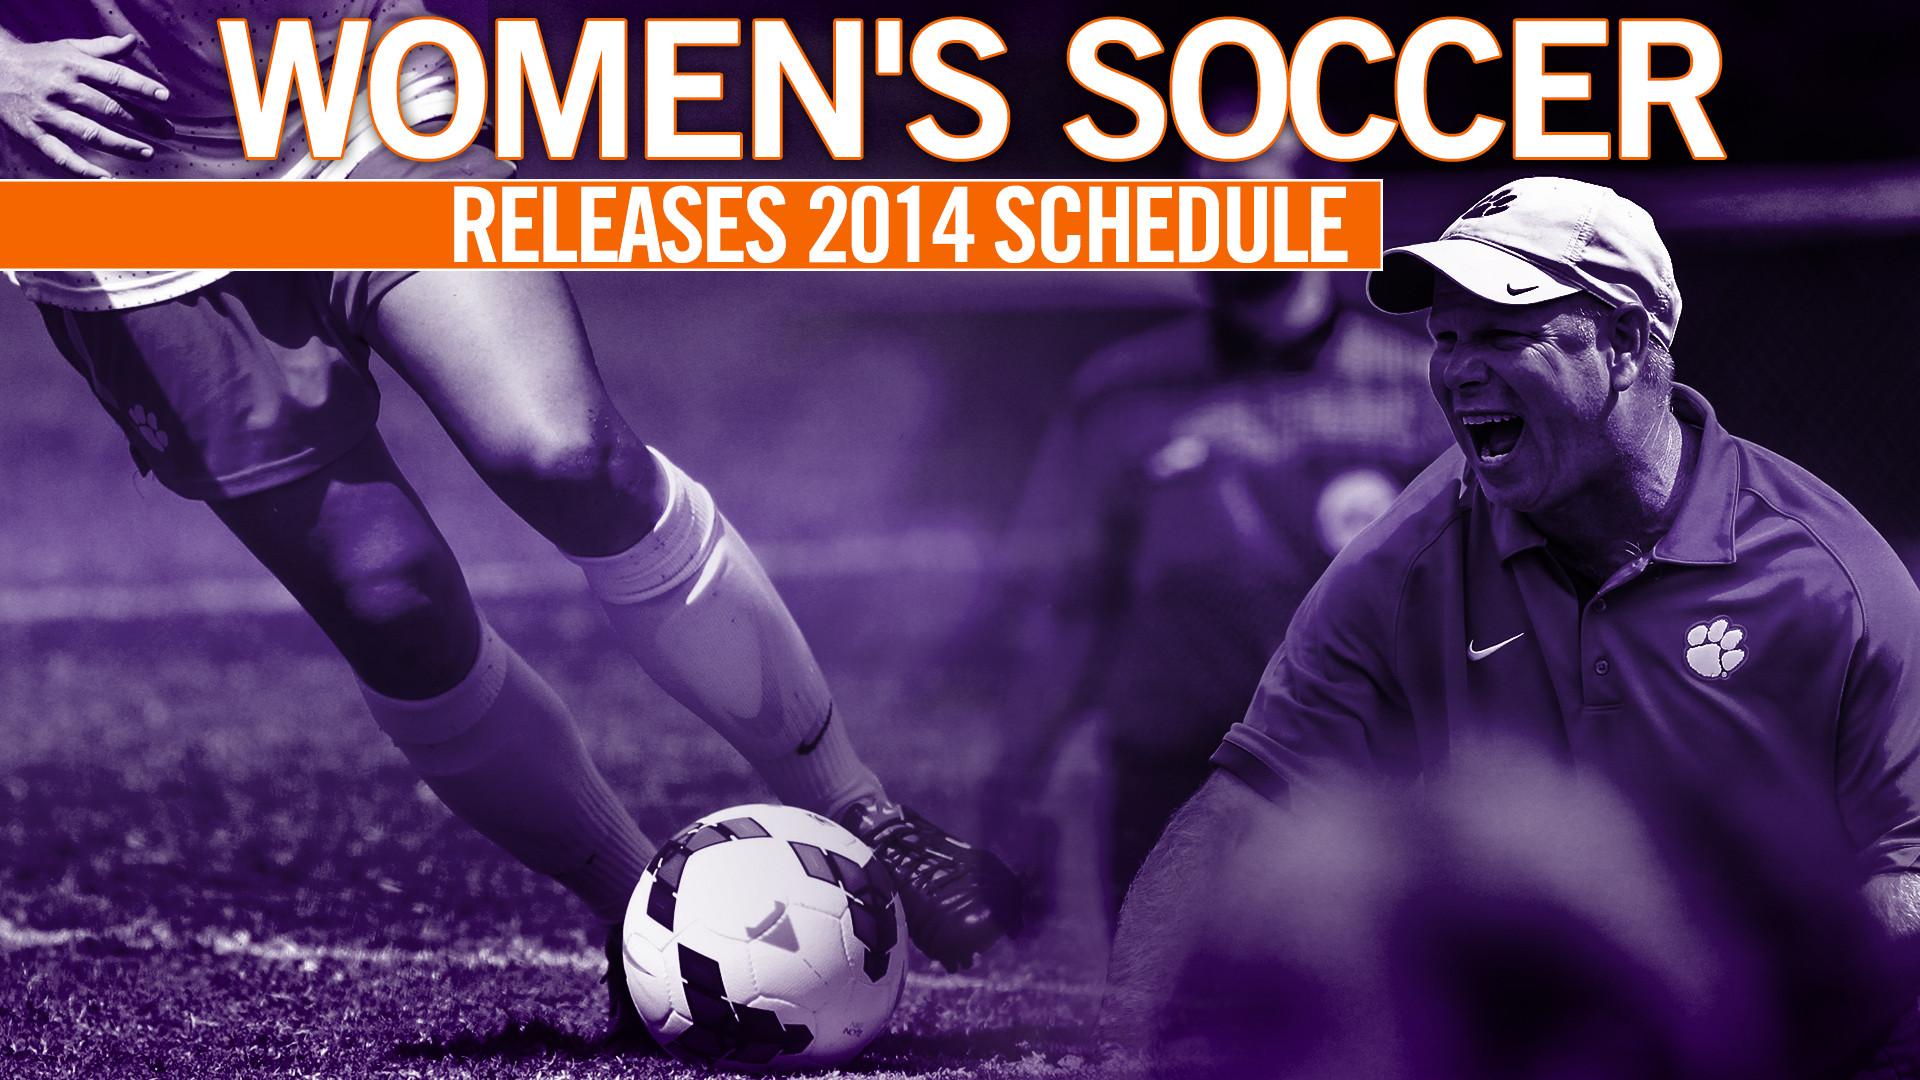 Clemson Women's Soccer Program Announces 2014 Schedule